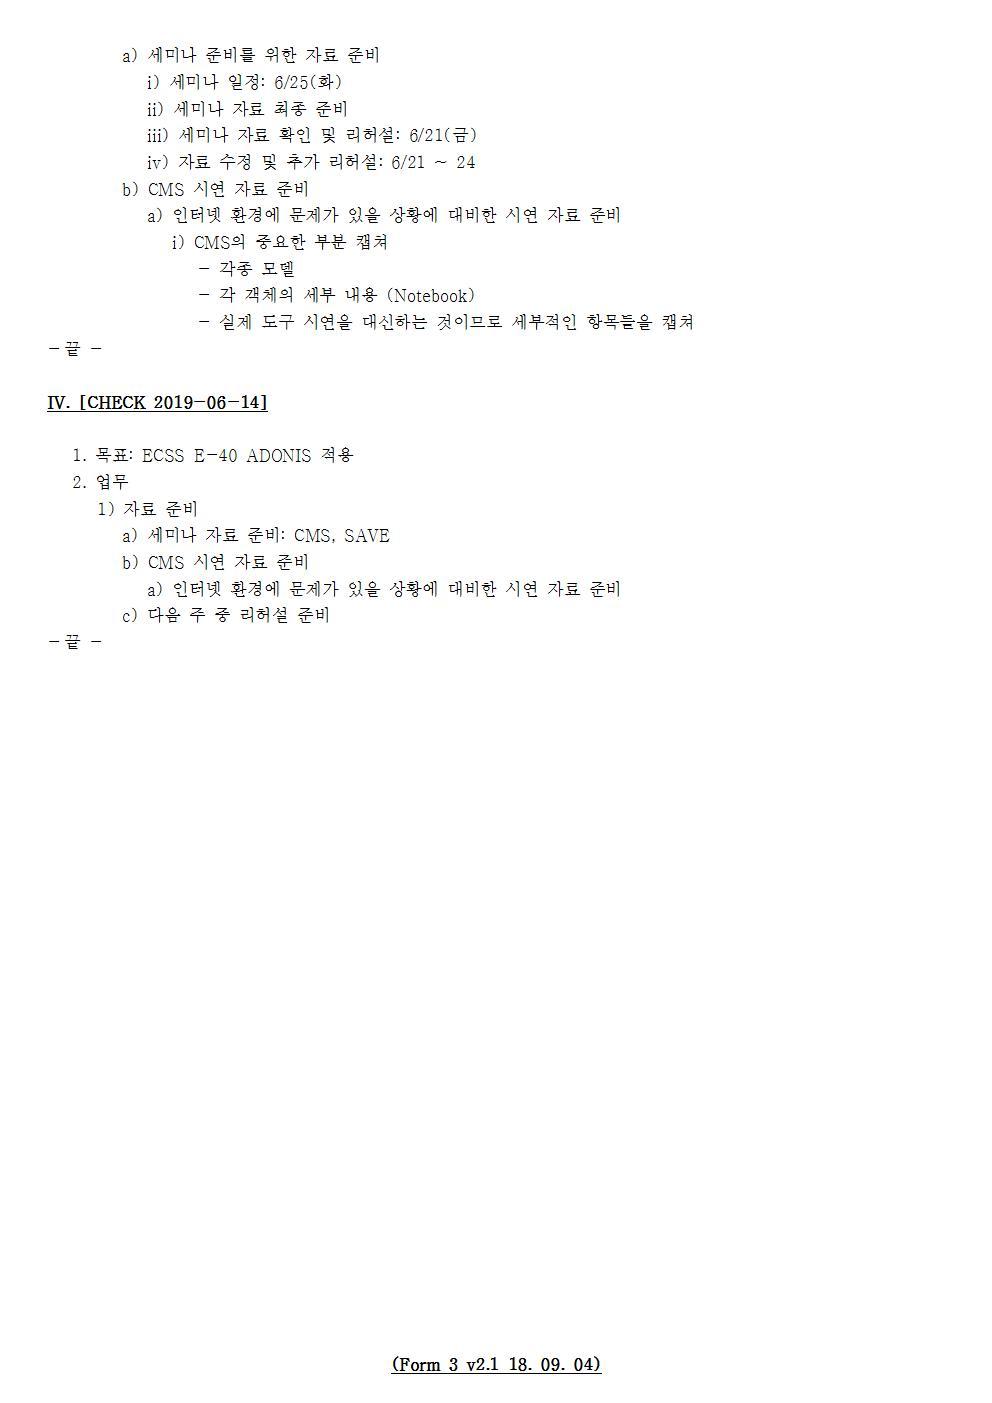 D-[19-004-RD-04]-[CMS]-[2019-06-14][YB]-[19-6-2]-[P+D+C]002.jpg